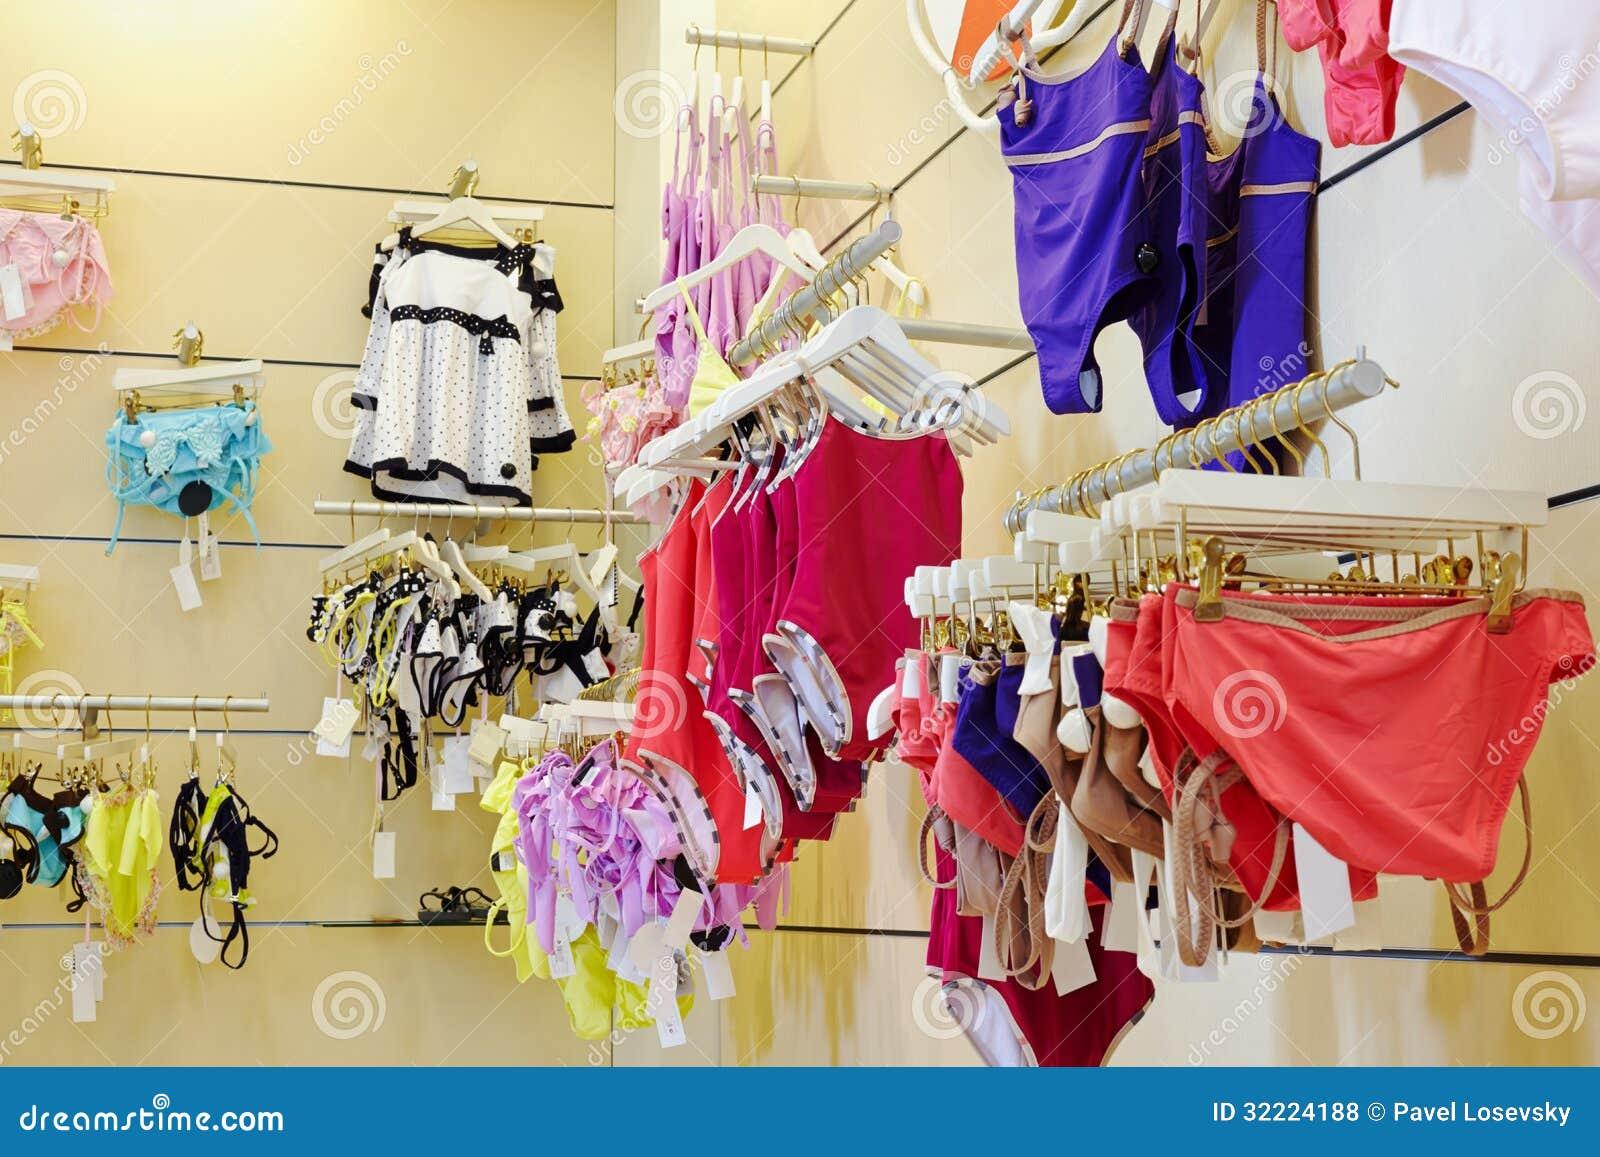 swim-suits-department-clothing-store-32224188.jpg